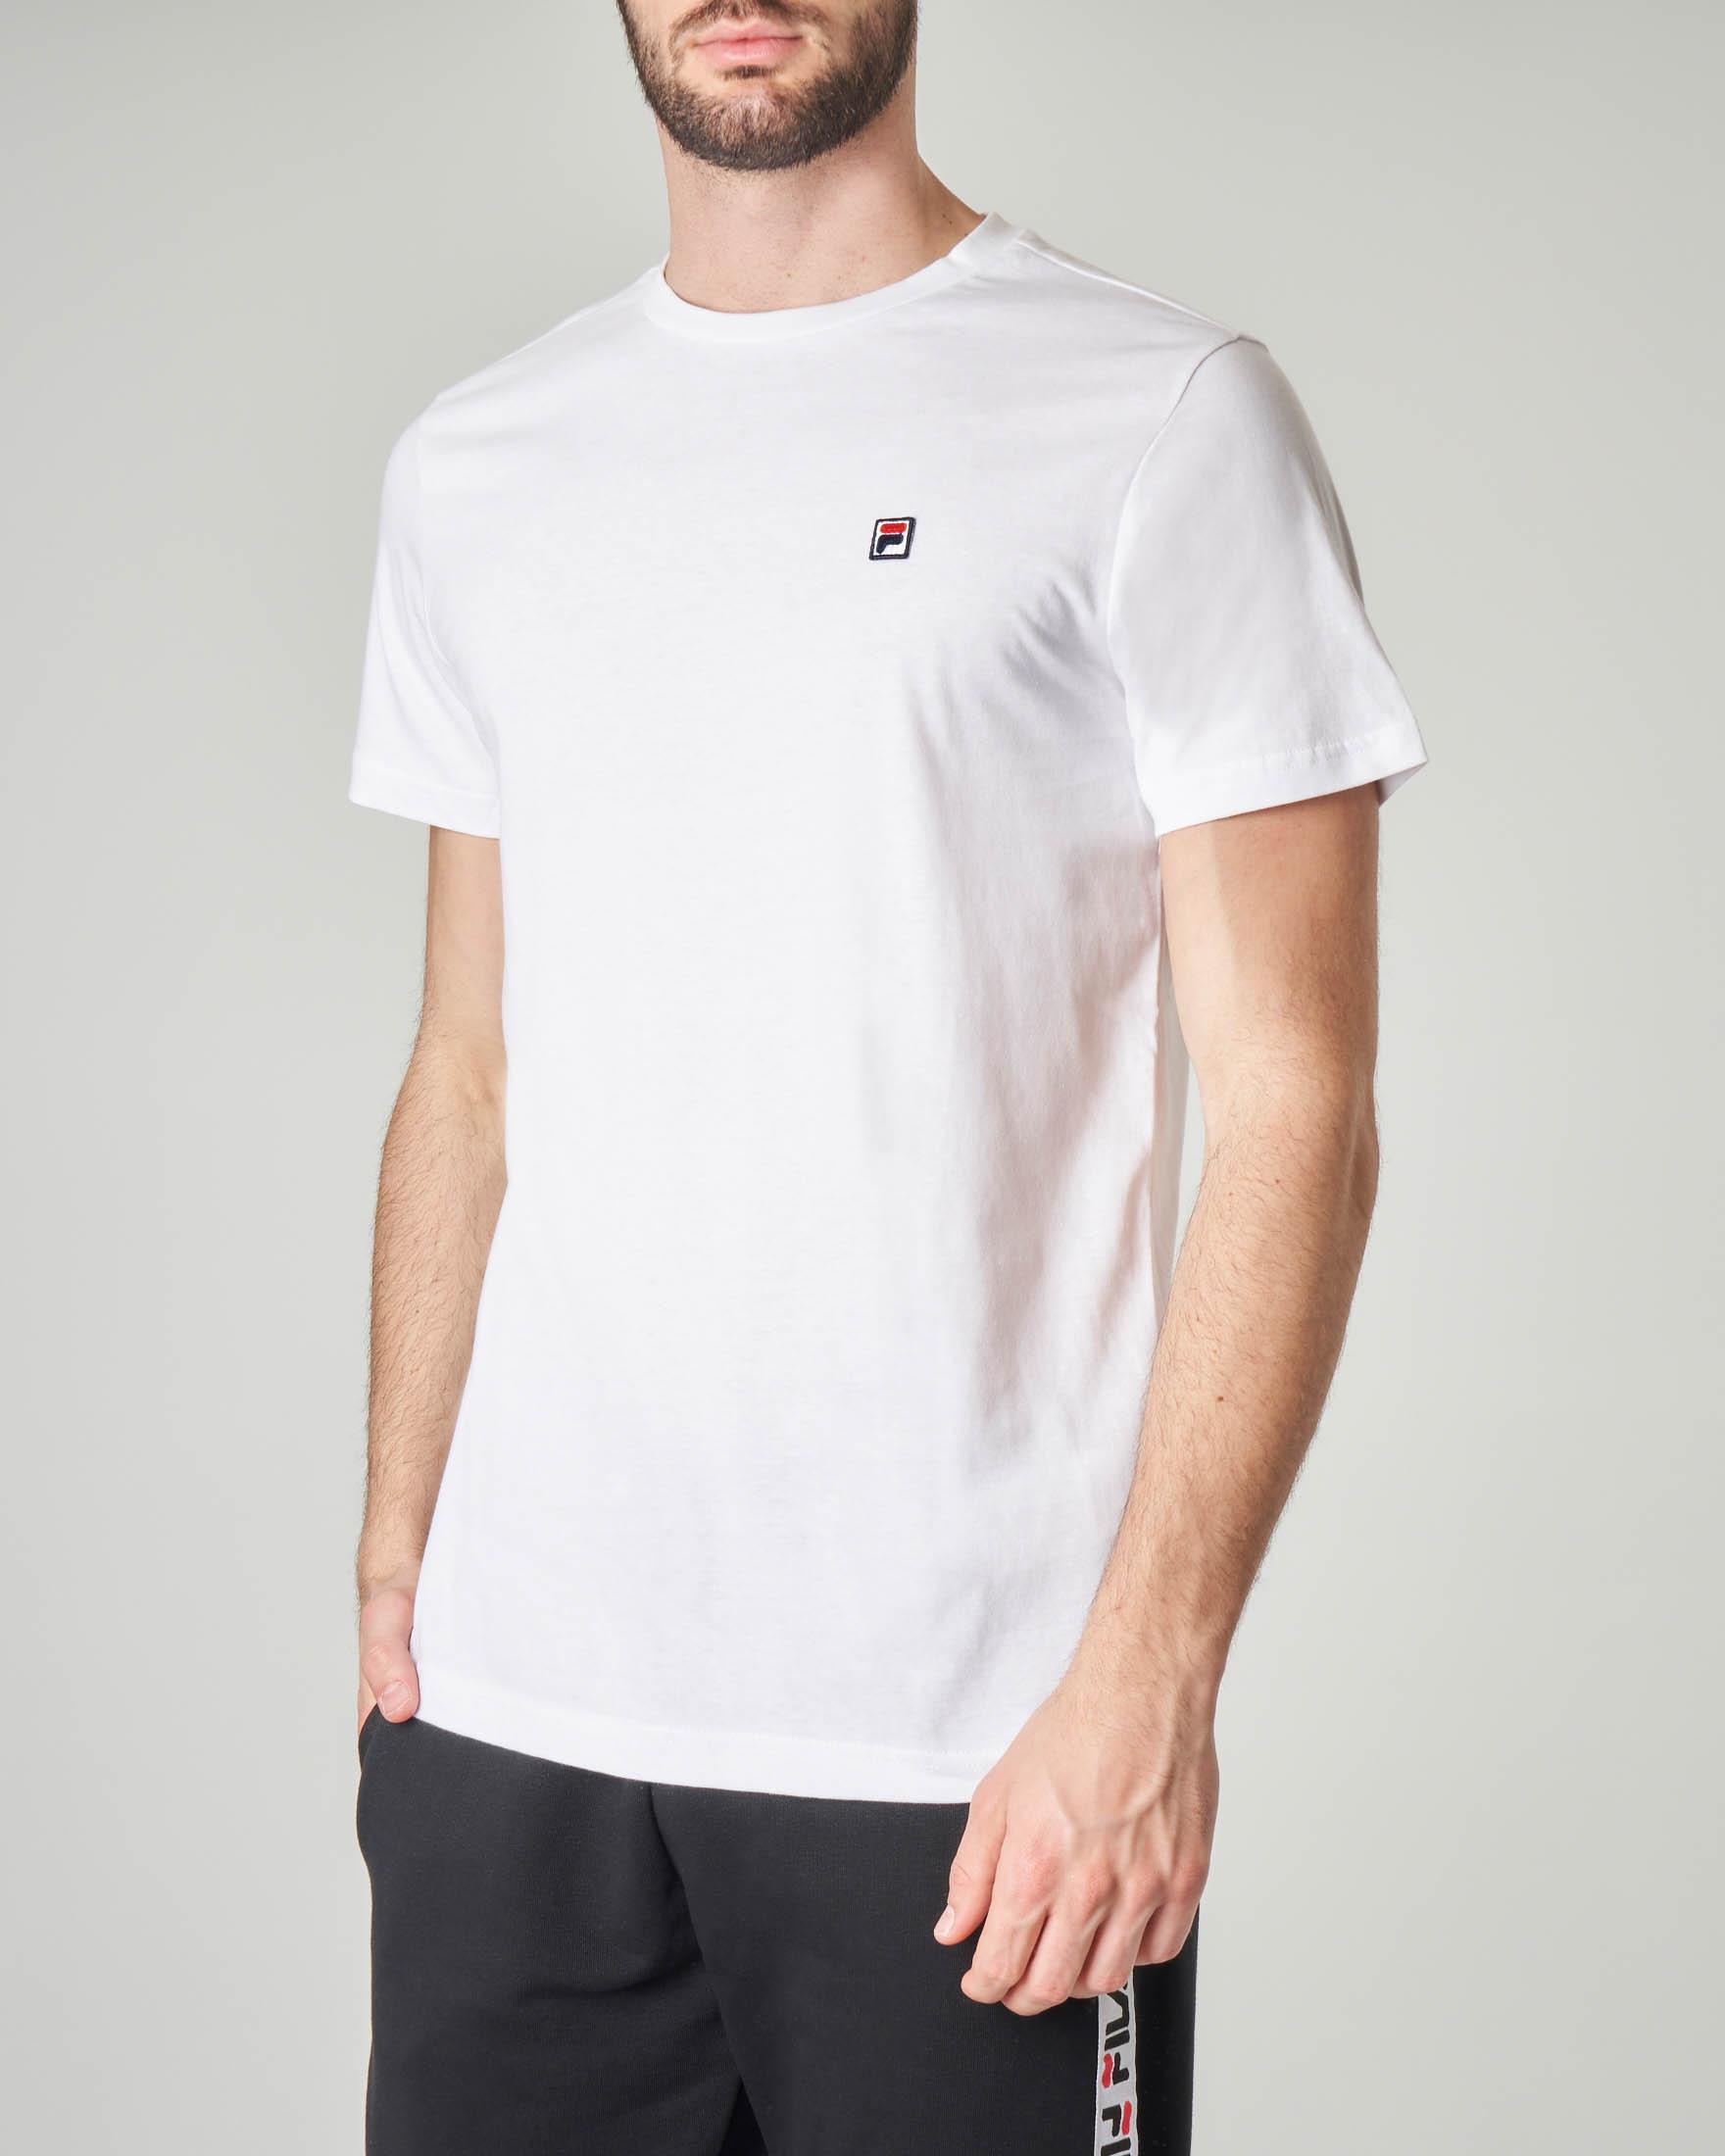 T-shirt bianca con logo piccolo